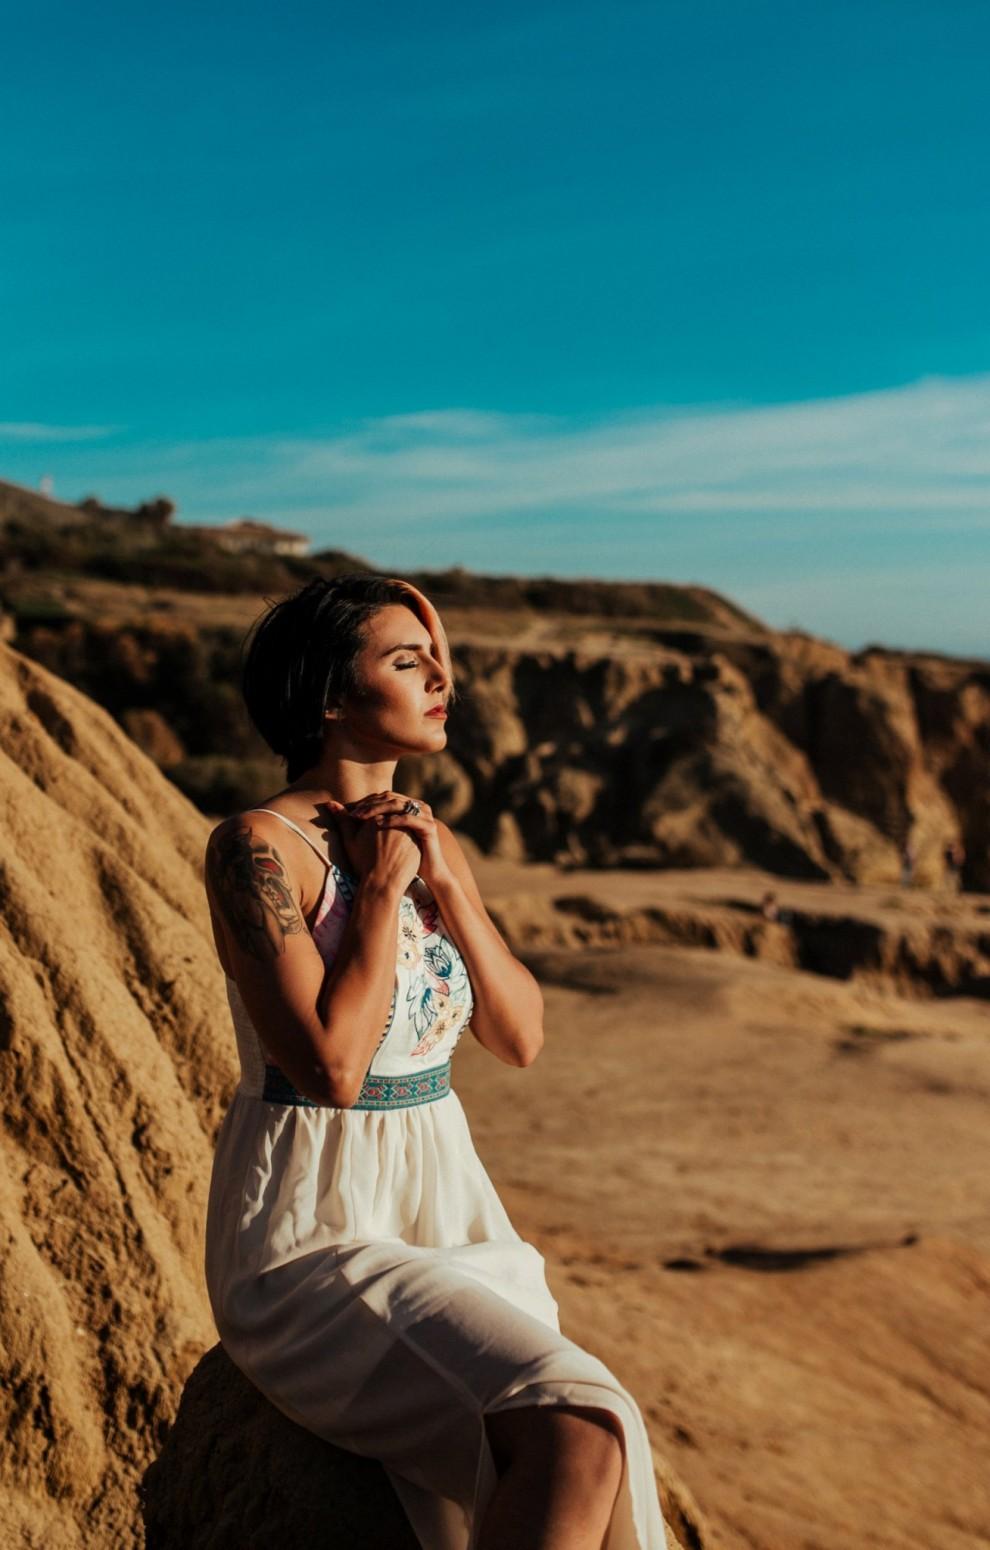 wild-native-photography-sandiego-destination-photographer-pittsburgh-sunset-cliffs_0235